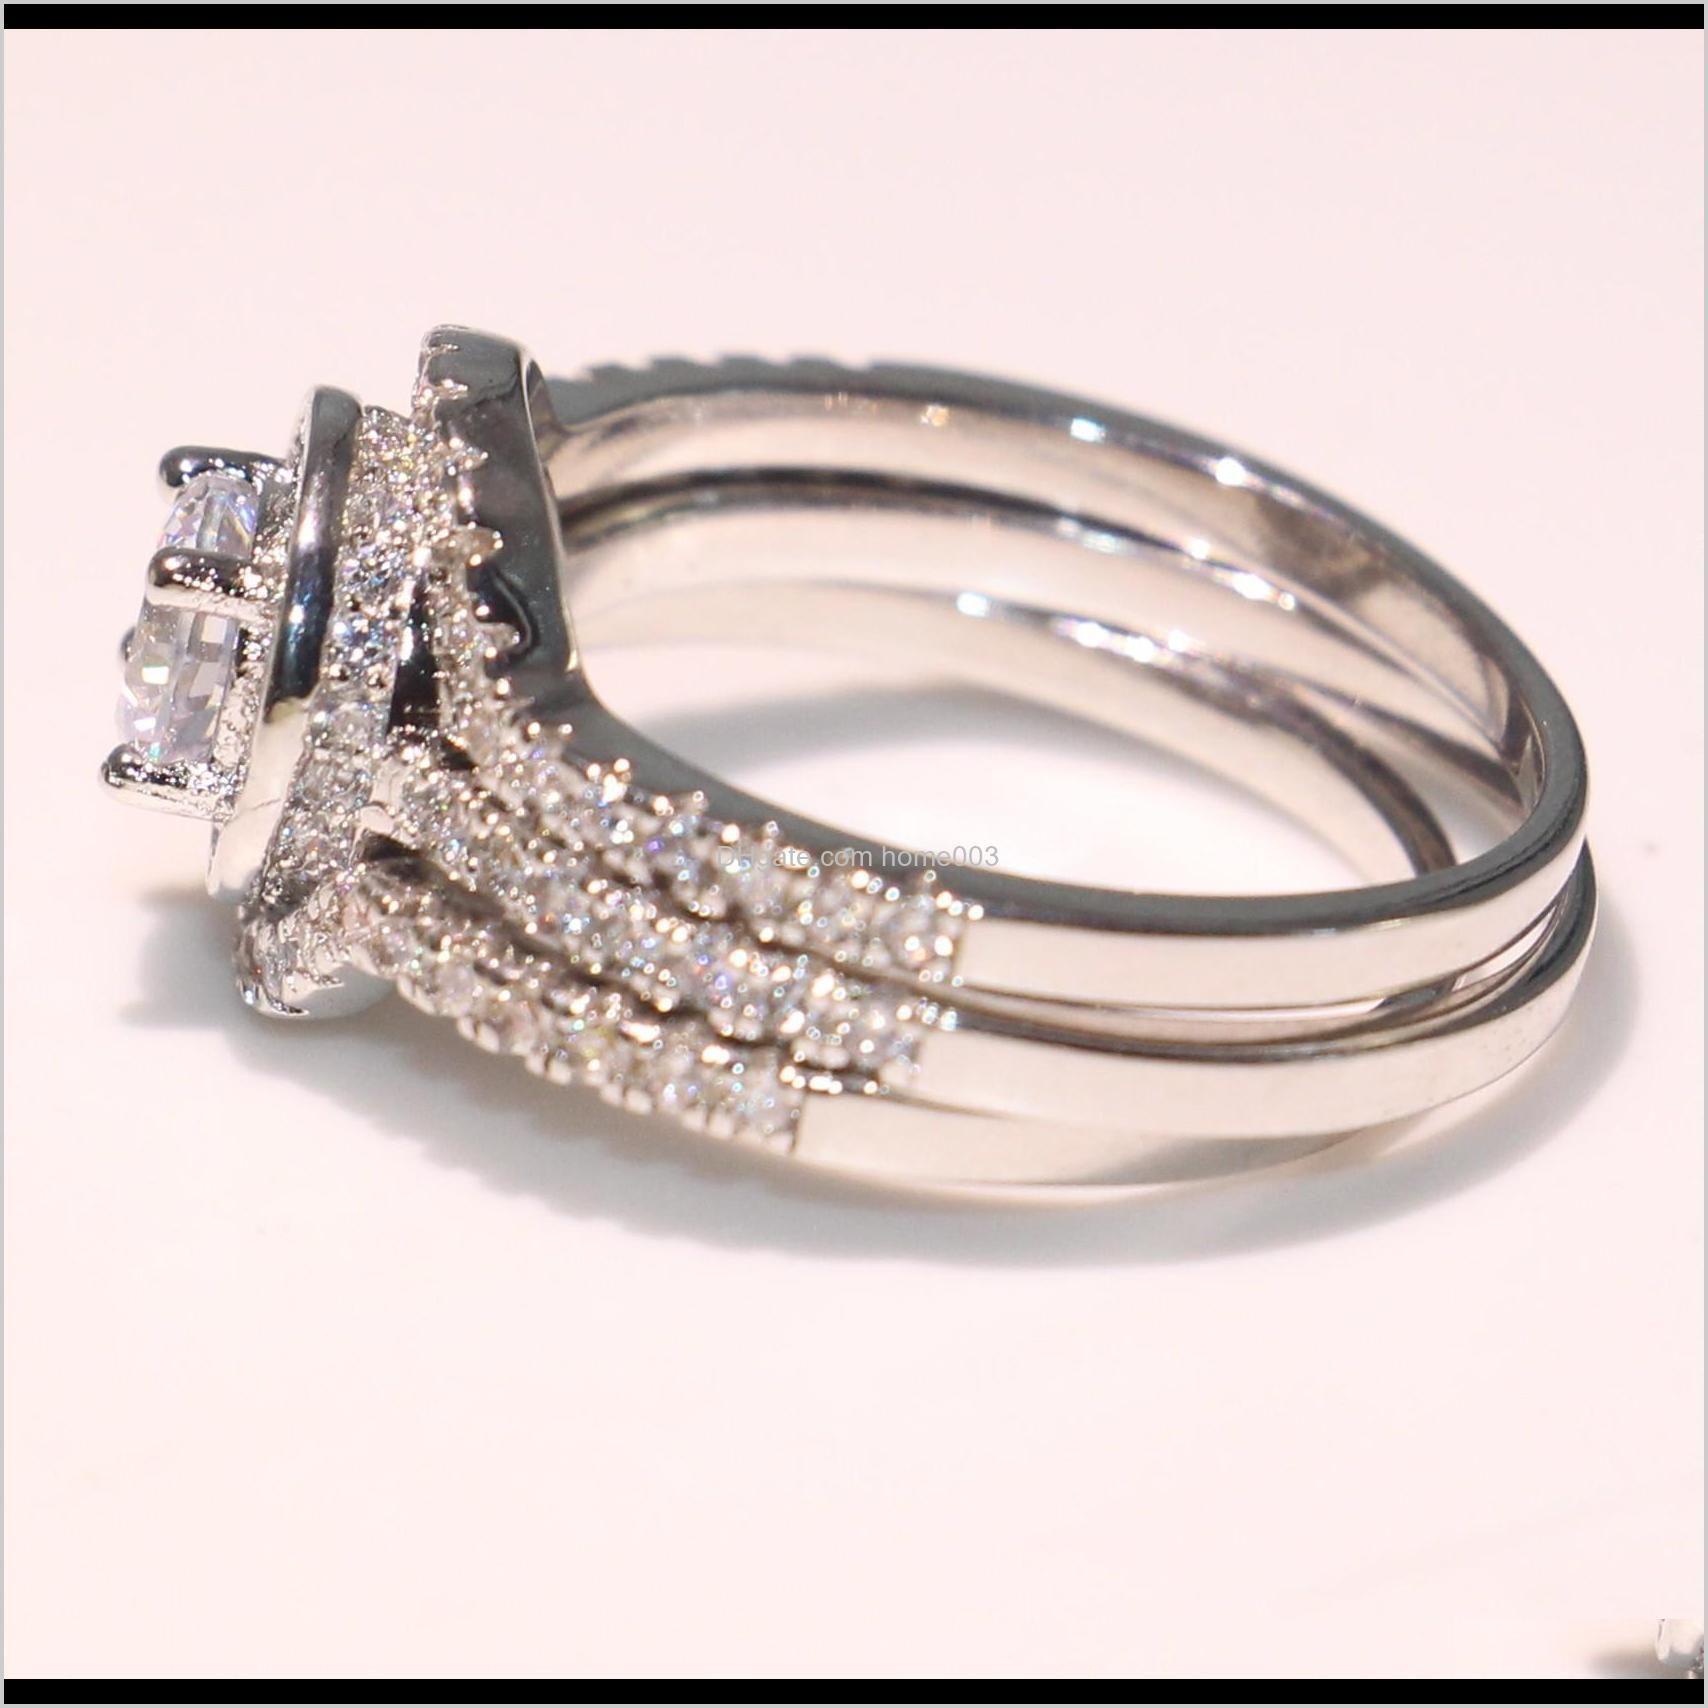 victoria wieck high quality luxury jewelry 10kt white gold fill round shape topaz pave cz diamond 3pcs lz1077